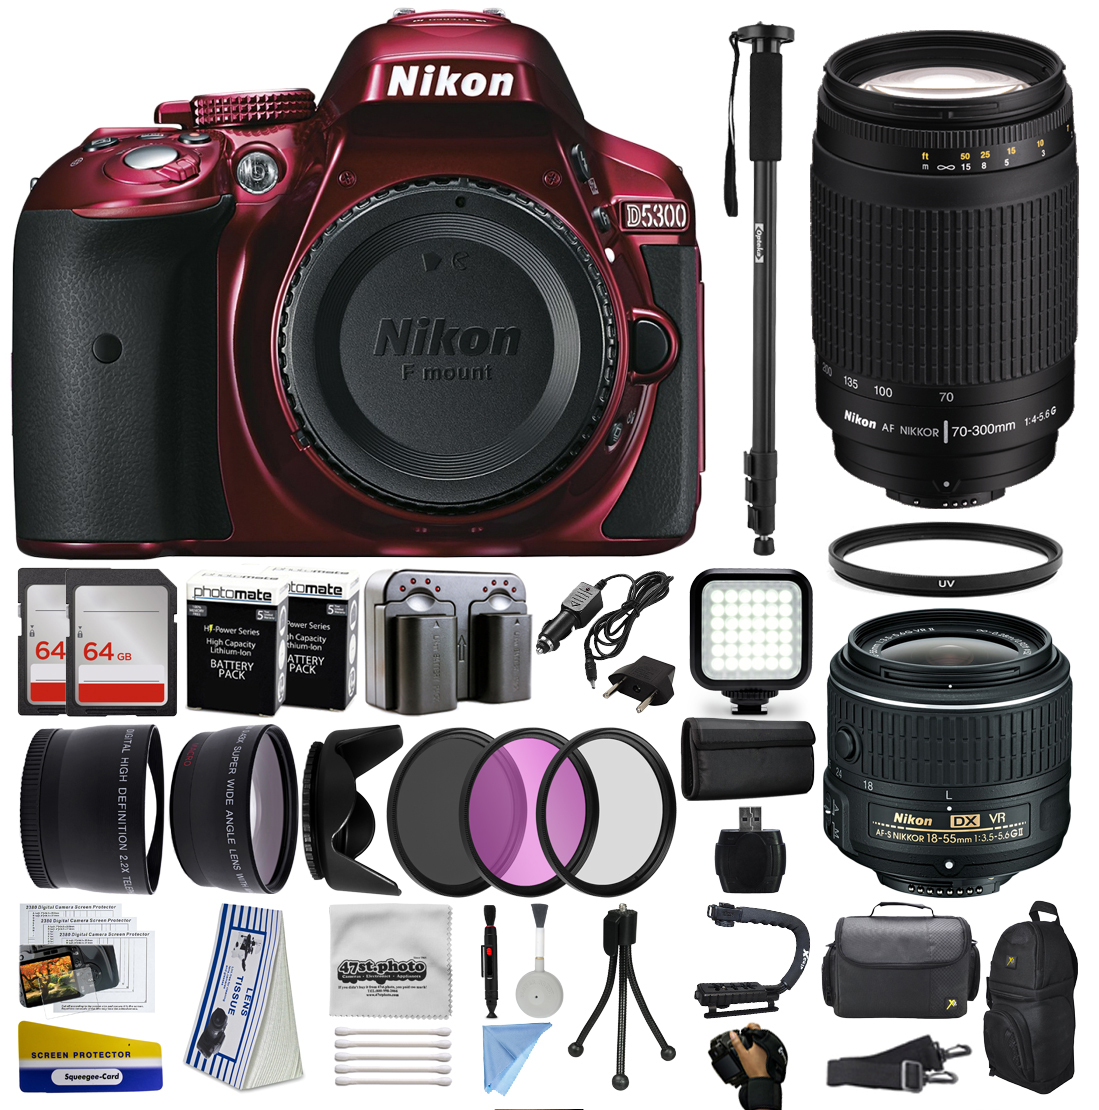 Nikon D5300 Red DSLR Digital Camera + 18-55mm VR II + 70-300mm f/4-5.6G Lens + 128GB Memory + (2) Batteries + Charger + LED Video Light + Backpack + Case + Filters + Auxiliary Lenses